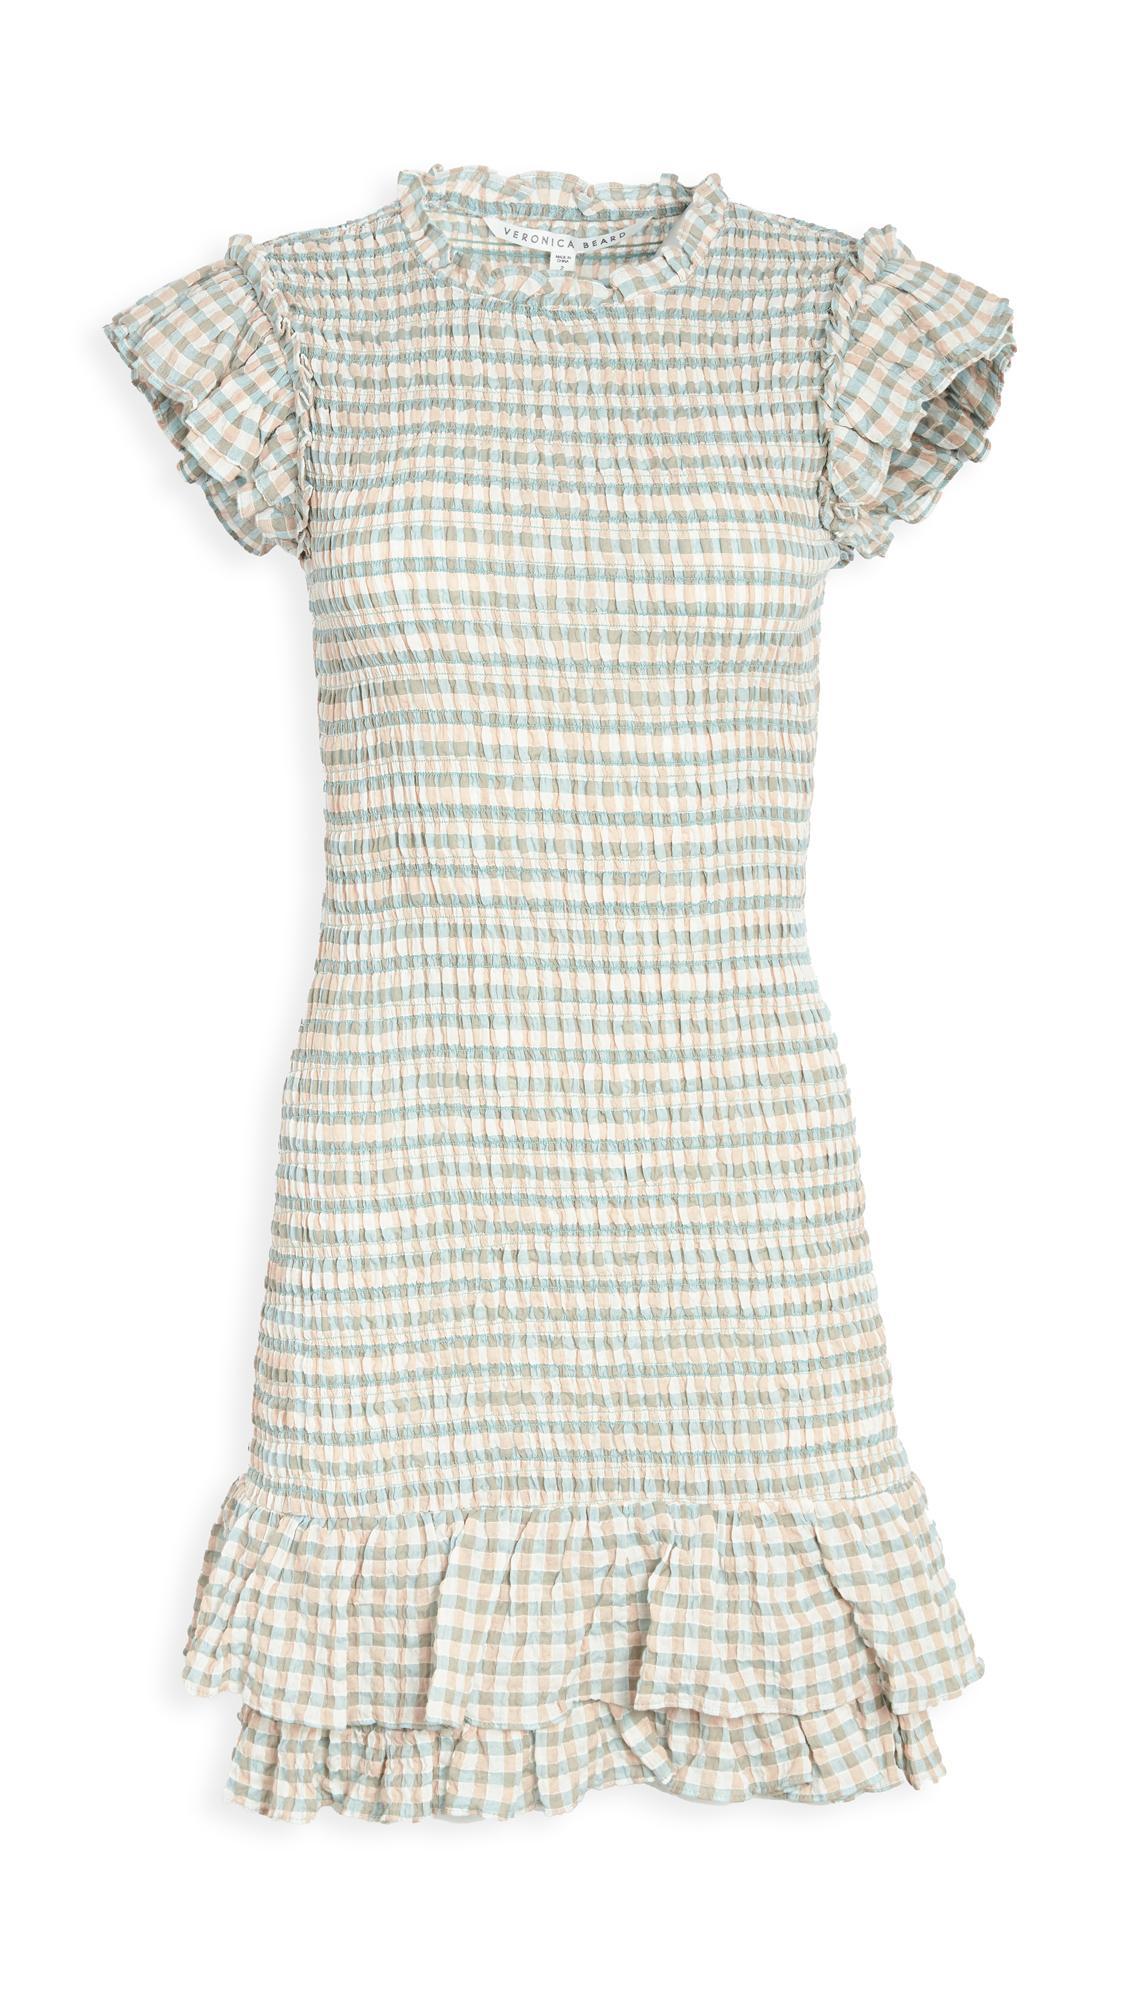 Veronica Beard Cici Dress